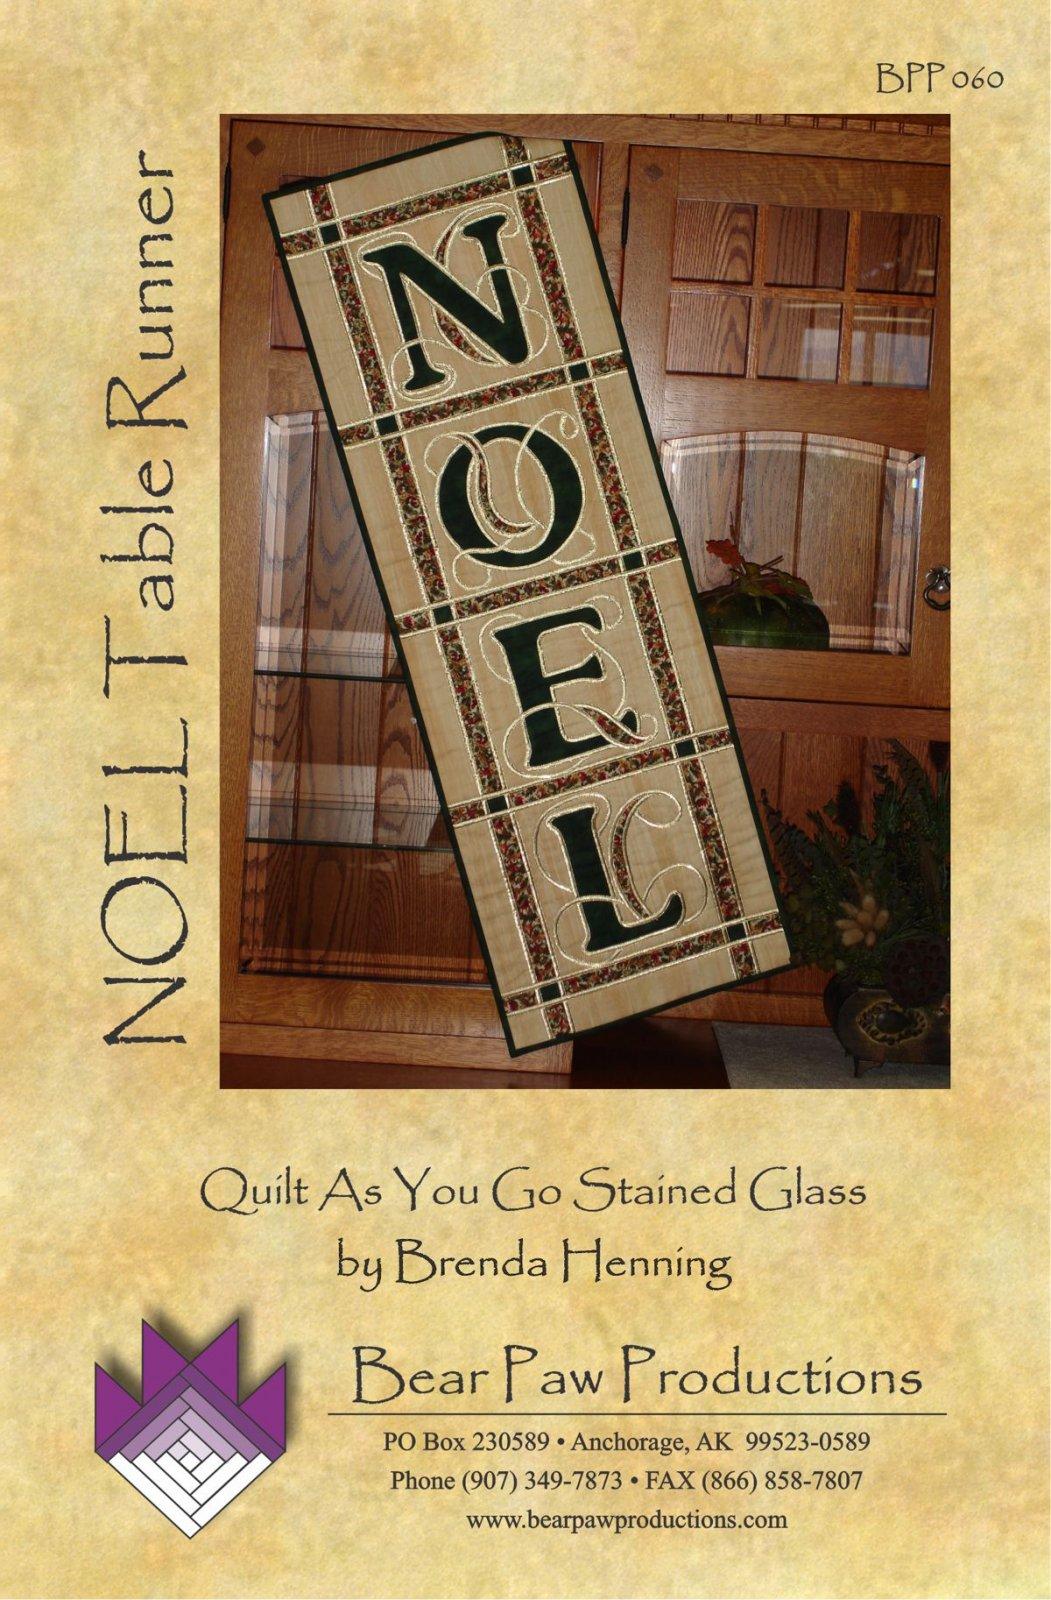 NOEL Table Runner in Stained Glass